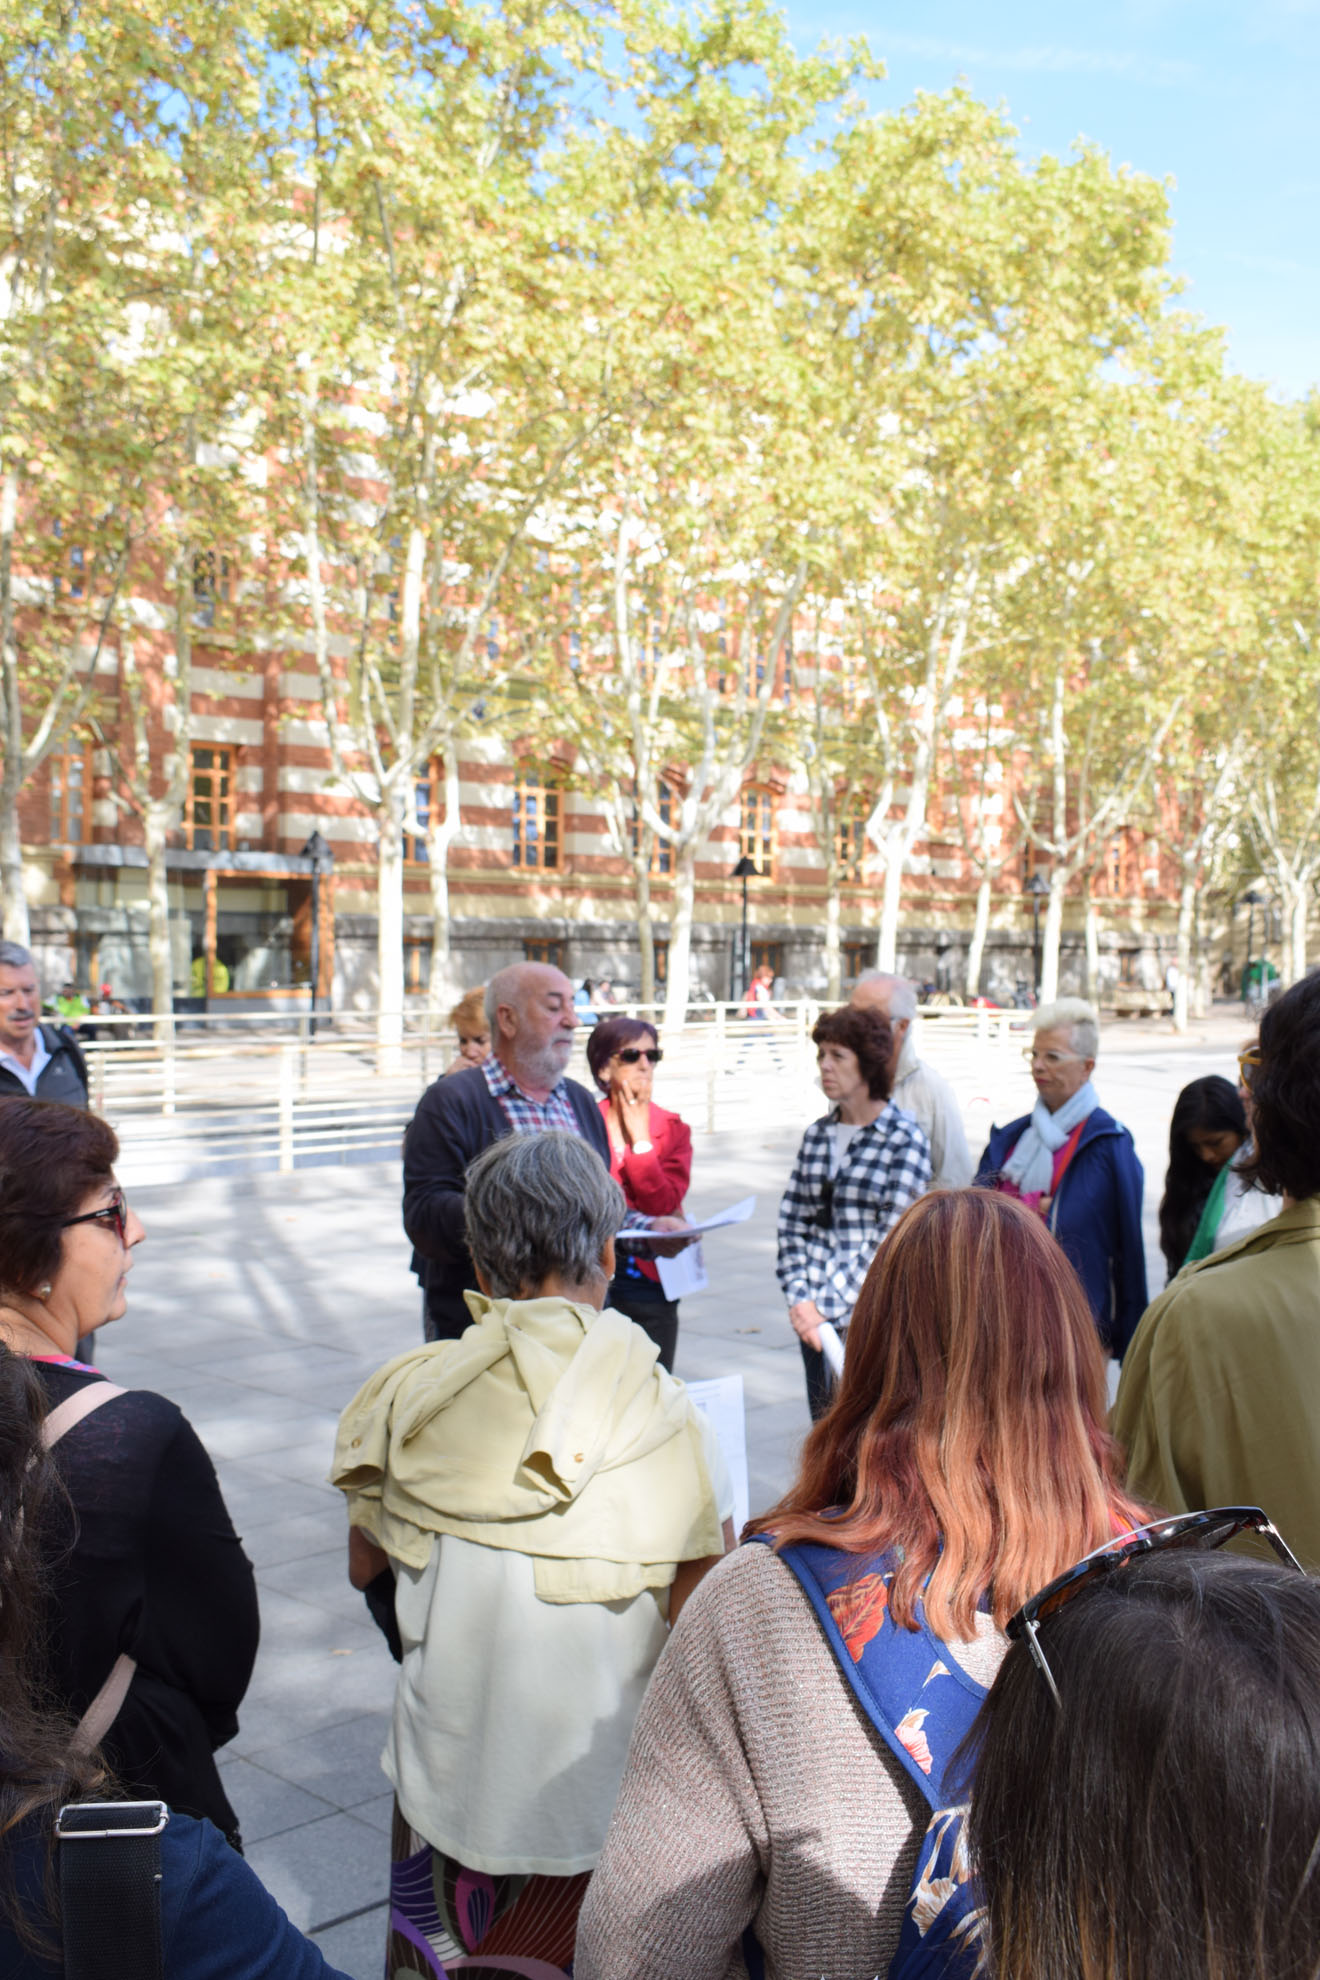 SEMANA-ARQUITECTURA-COAR-FCAR-paseo-espolon-glorieta-plaza-ayuntamiento-jose-miguel-leon (28)